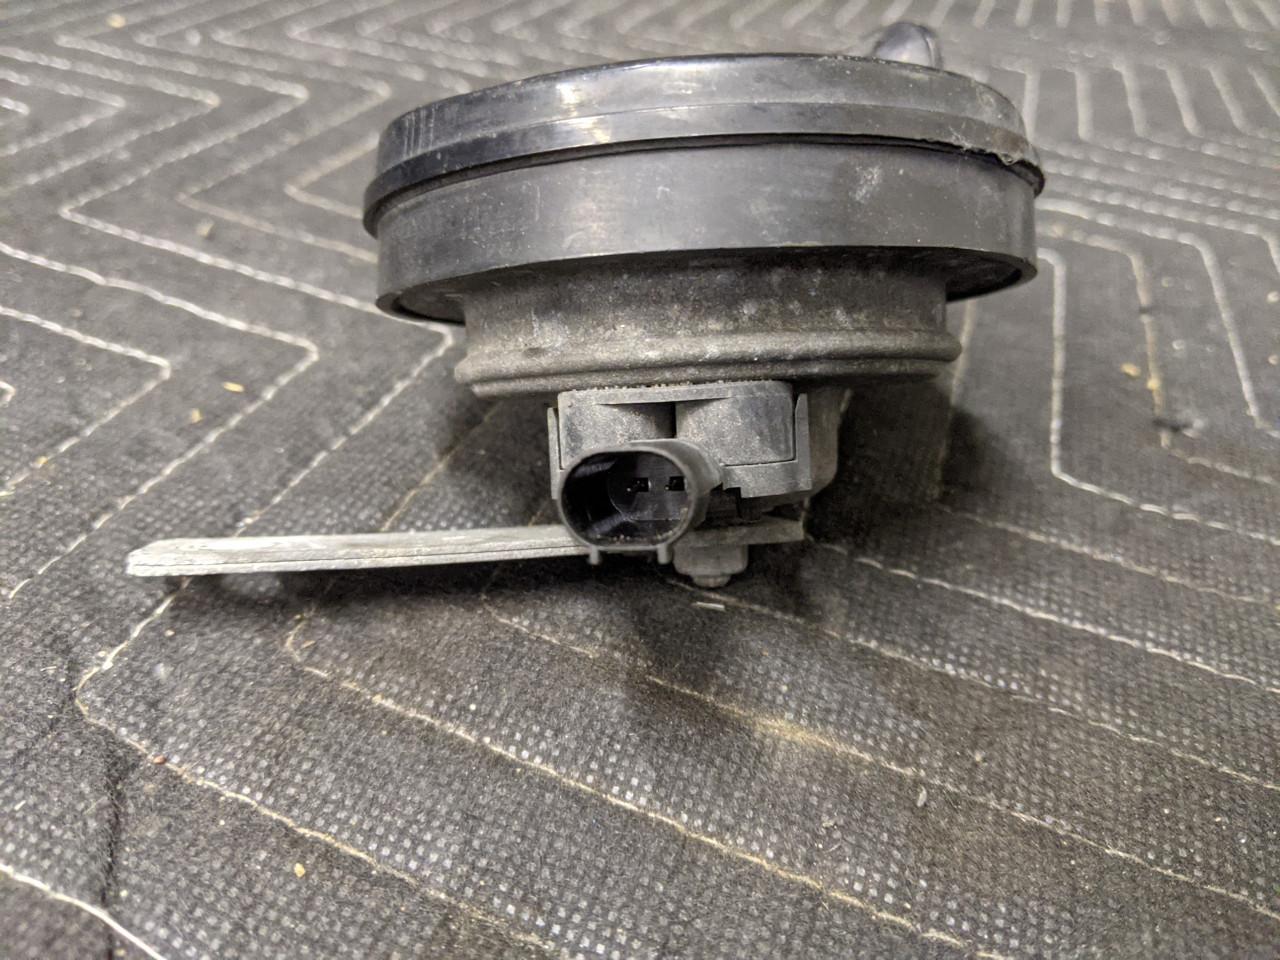 BMW E38 7-Series Horn Low Pitch Fiamm 410 Hz 61338361309